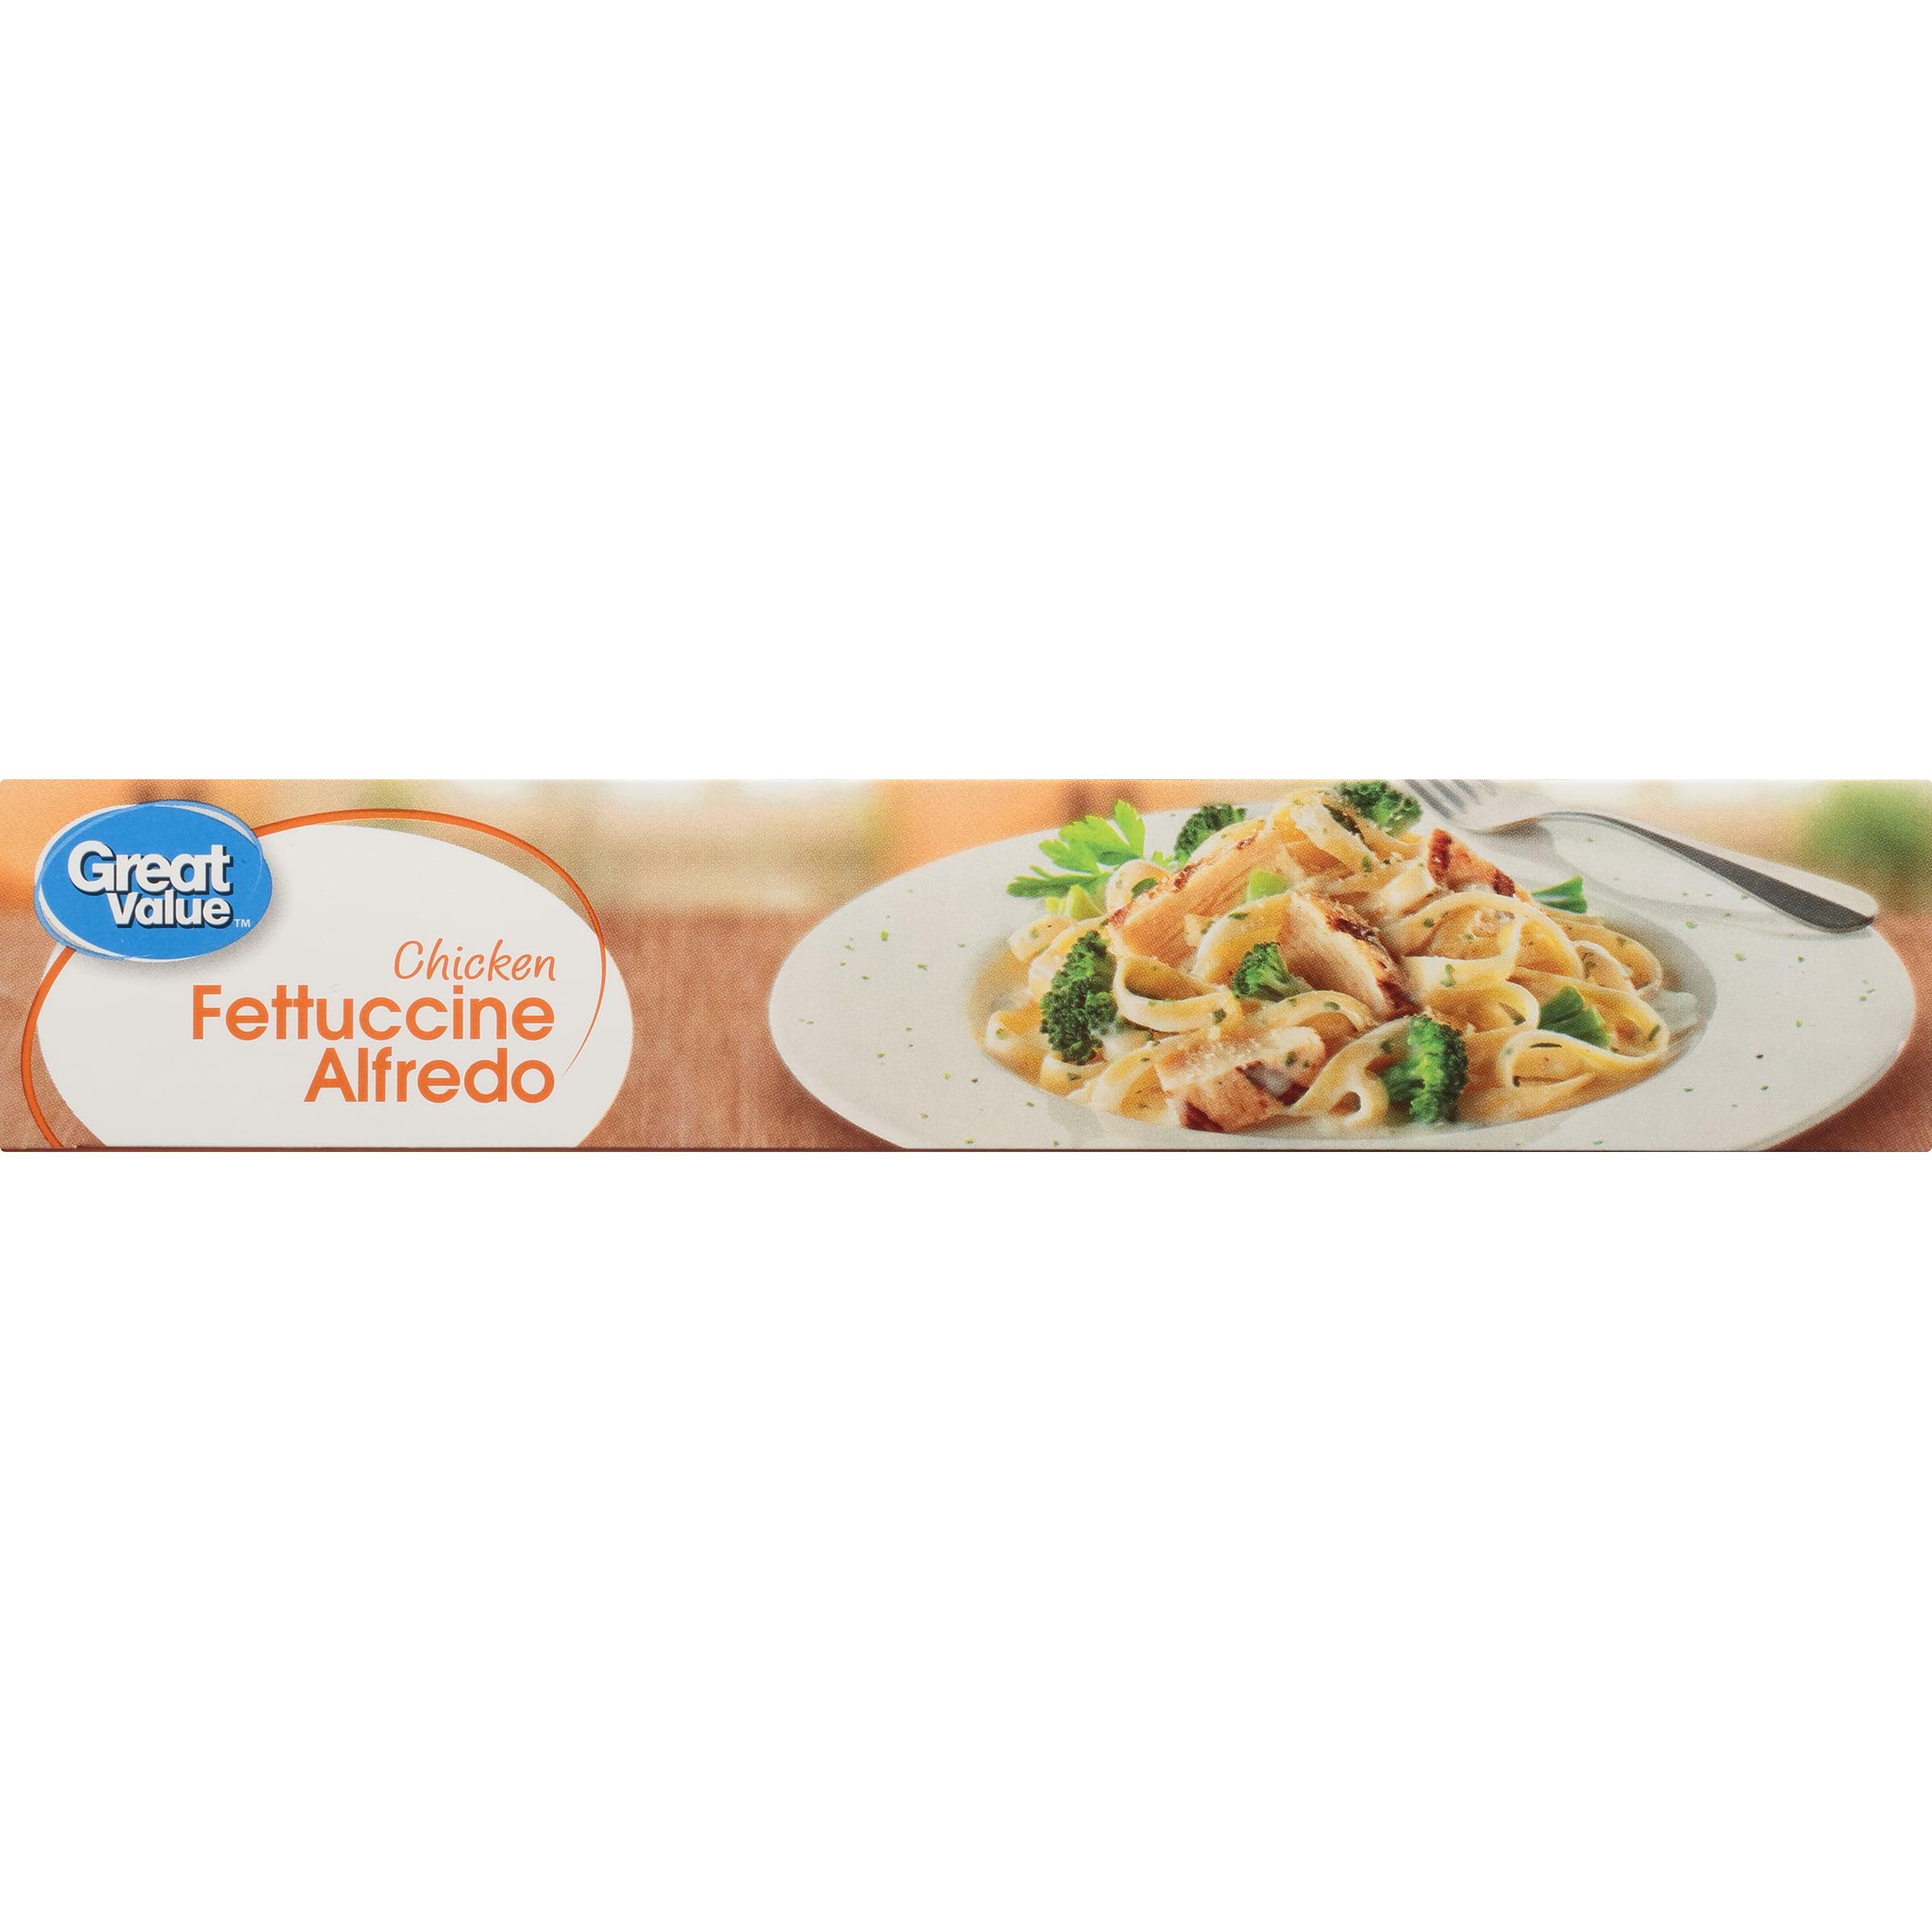 Great Value Chicken Fettuccine Alfredo, 10 oz - Walmart.com